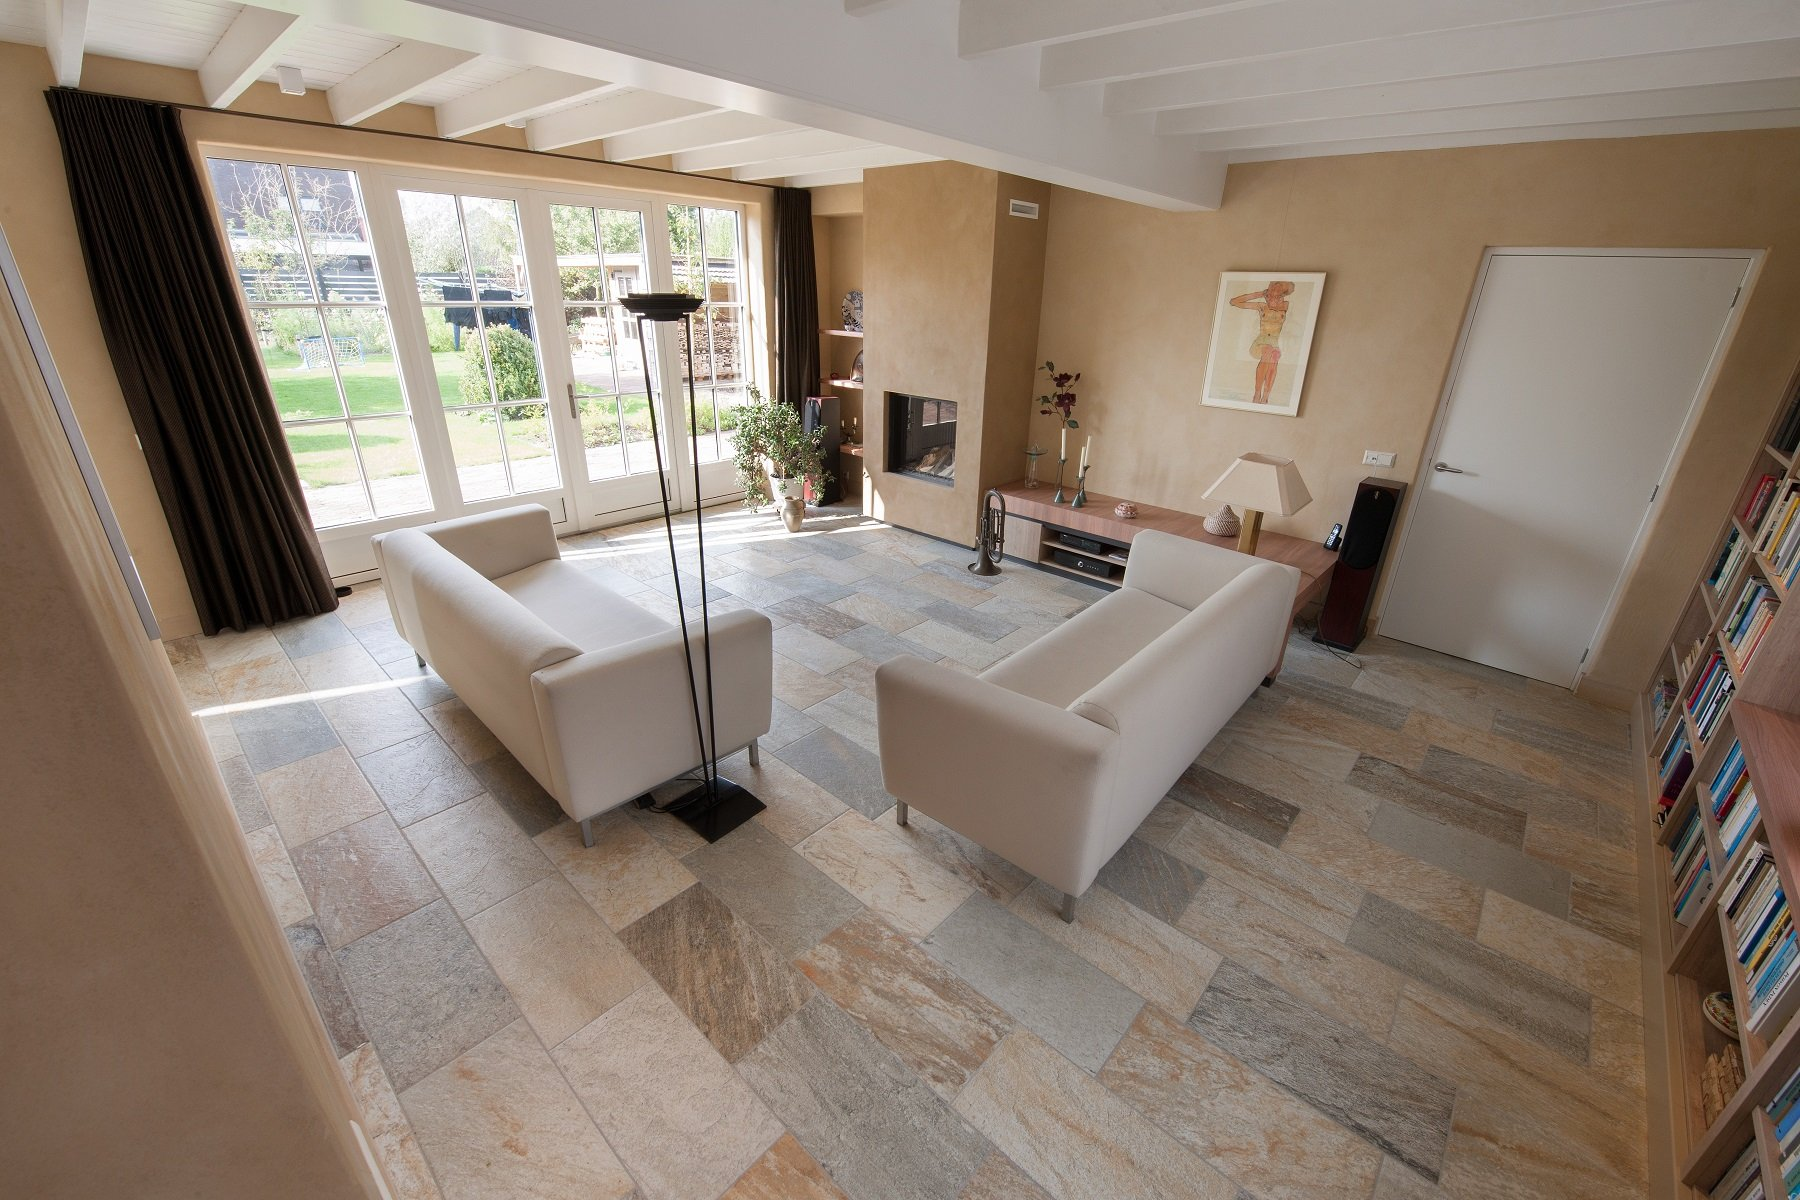 Vloertegels woonkamer kroon vloeren in steen - Kiezen tegelvloer ...